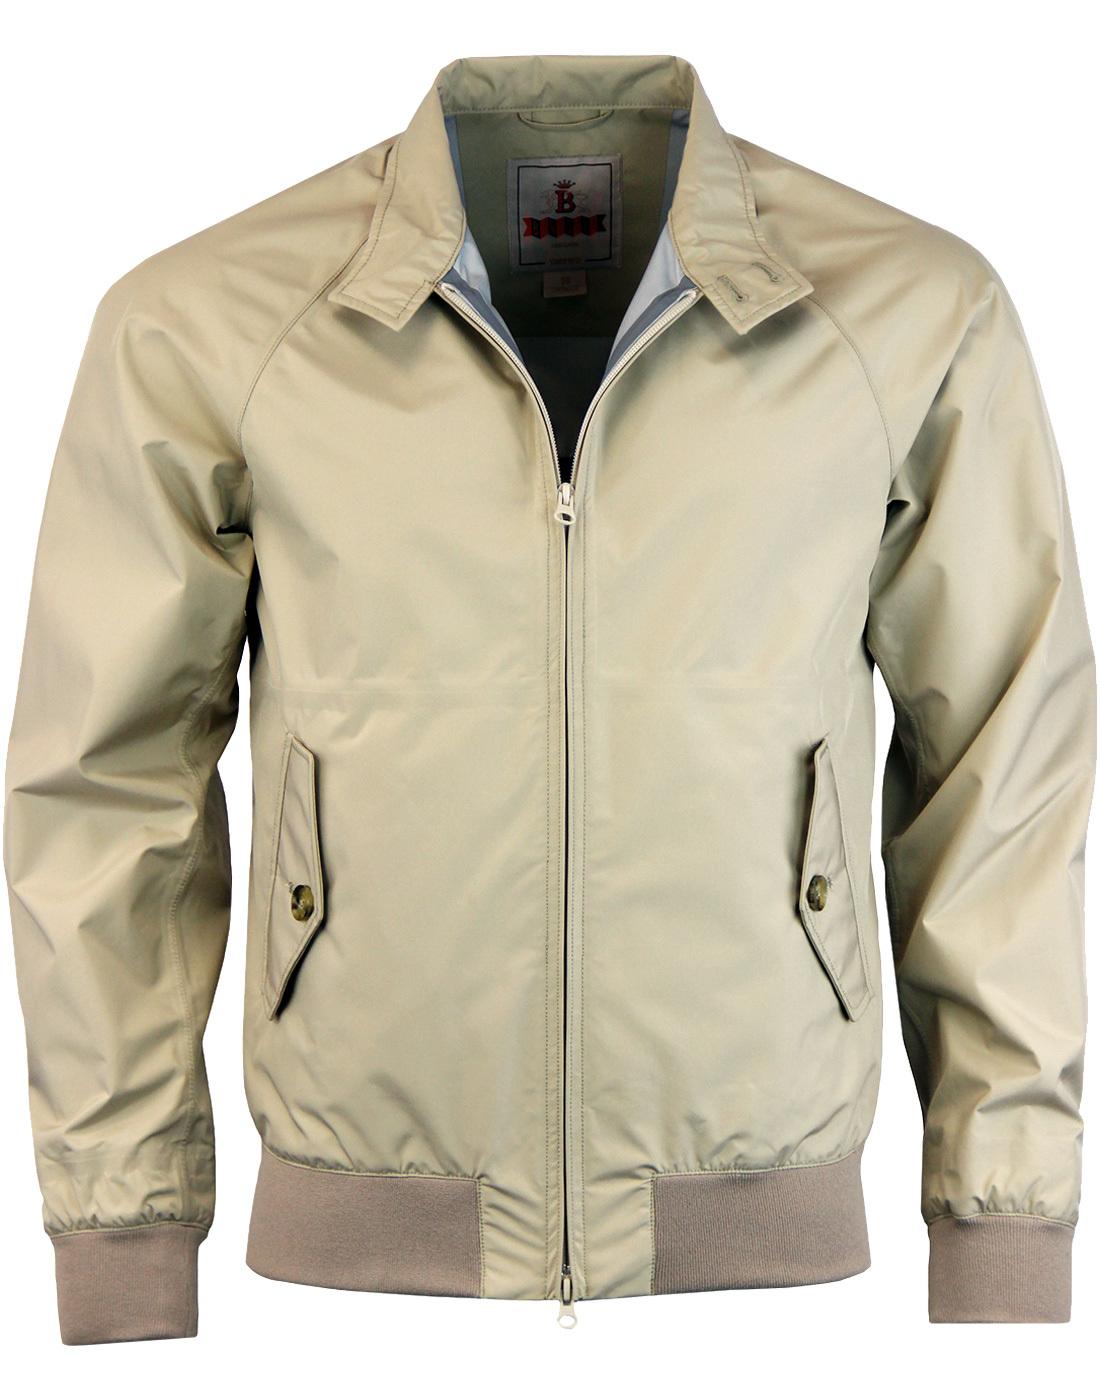 BARACUTA G9 Baratex 3L Harrington Jacket - Beige